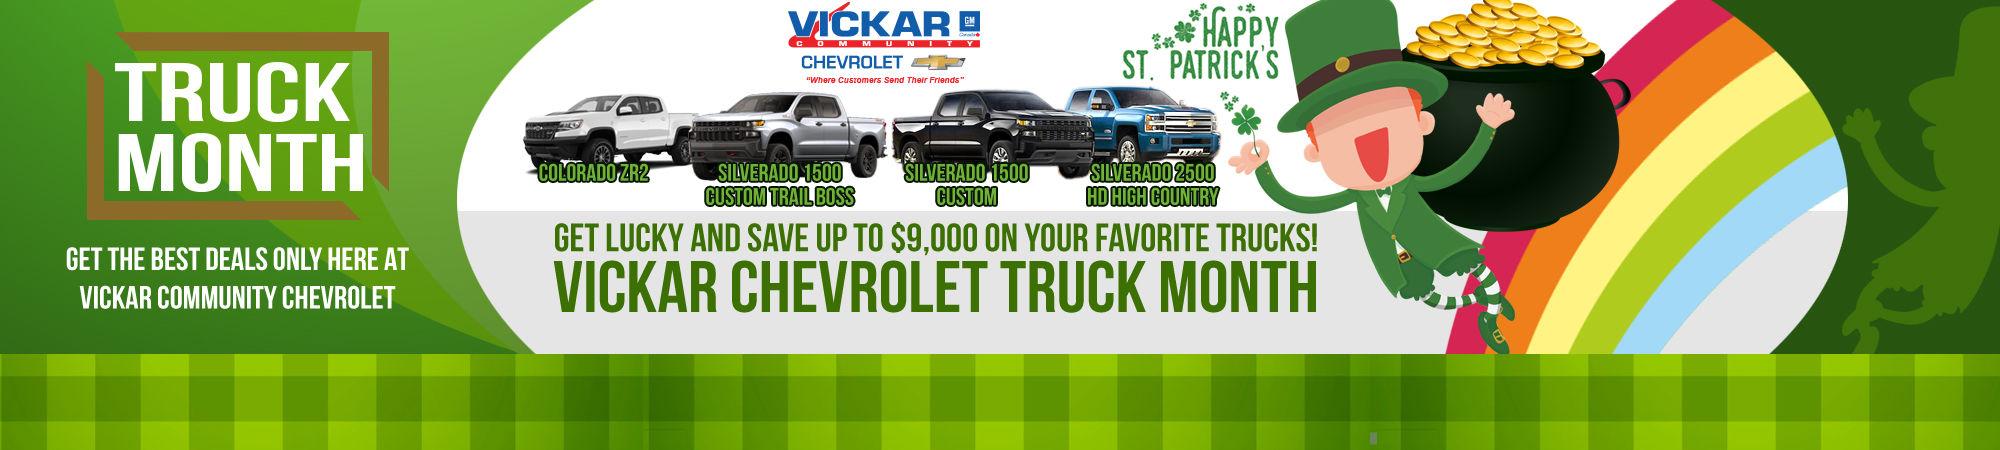 Vickar Chevrolet St Patrick - WEB